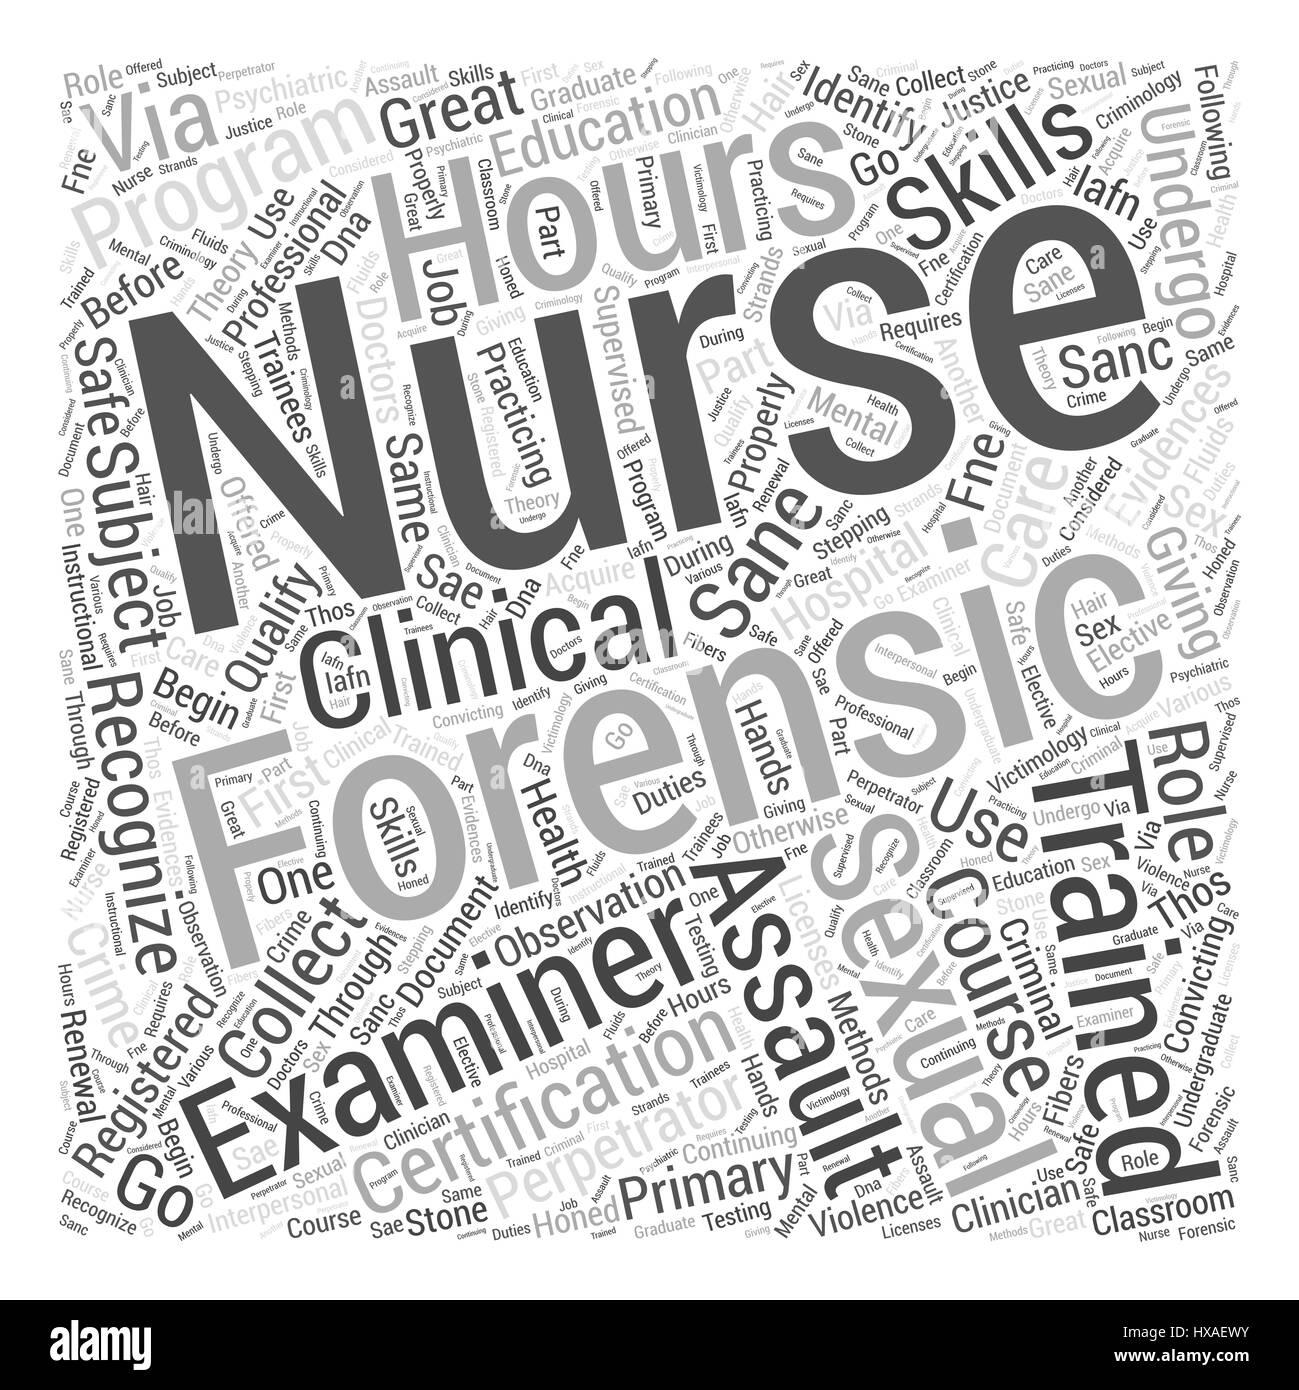 Forensic nursing certifications word cloud concept stock vector forensic nursing certifications word cloud concept xflitez Choice Image